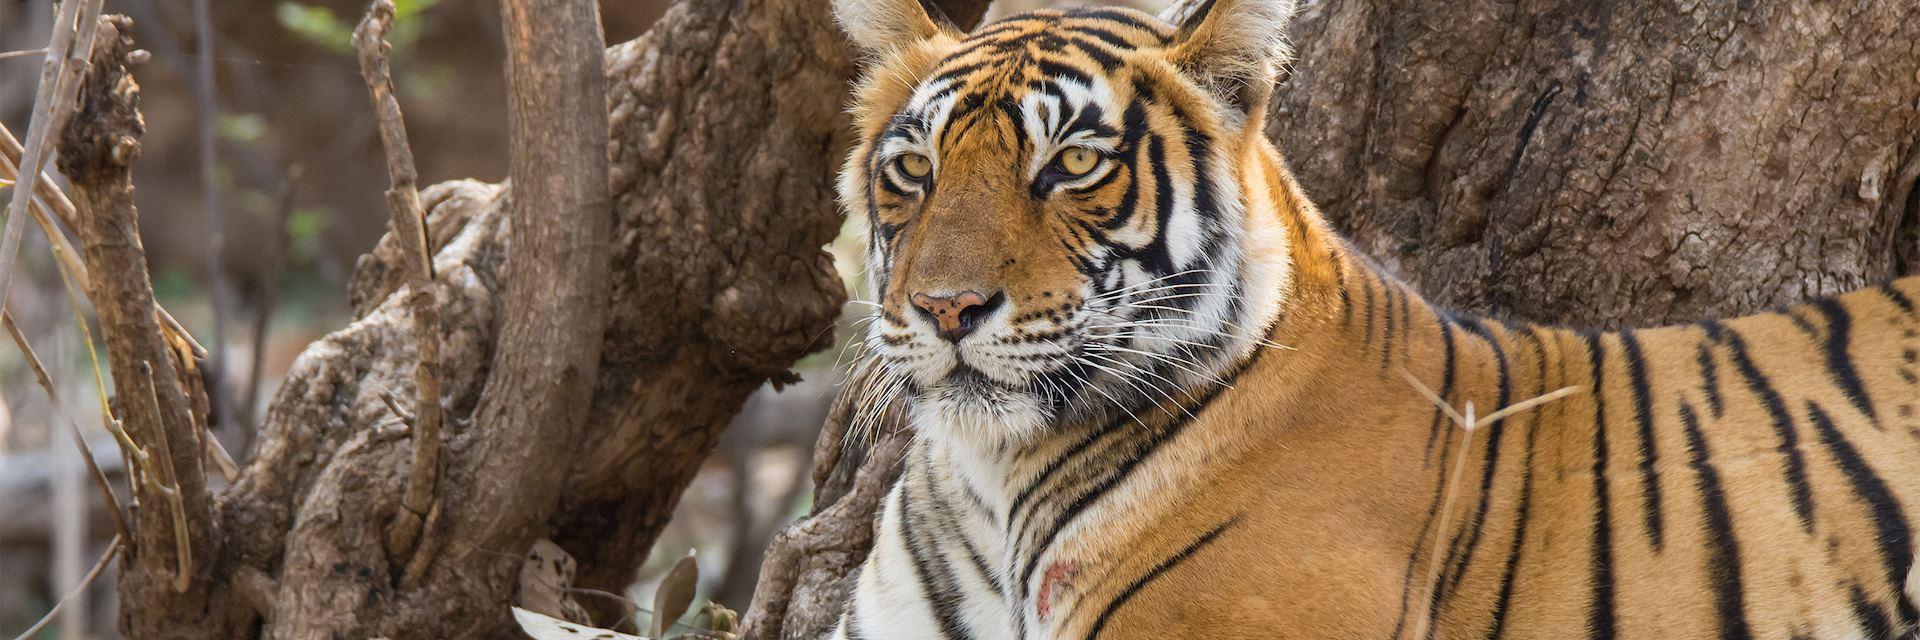 Tiger, Ranthambhore National Park